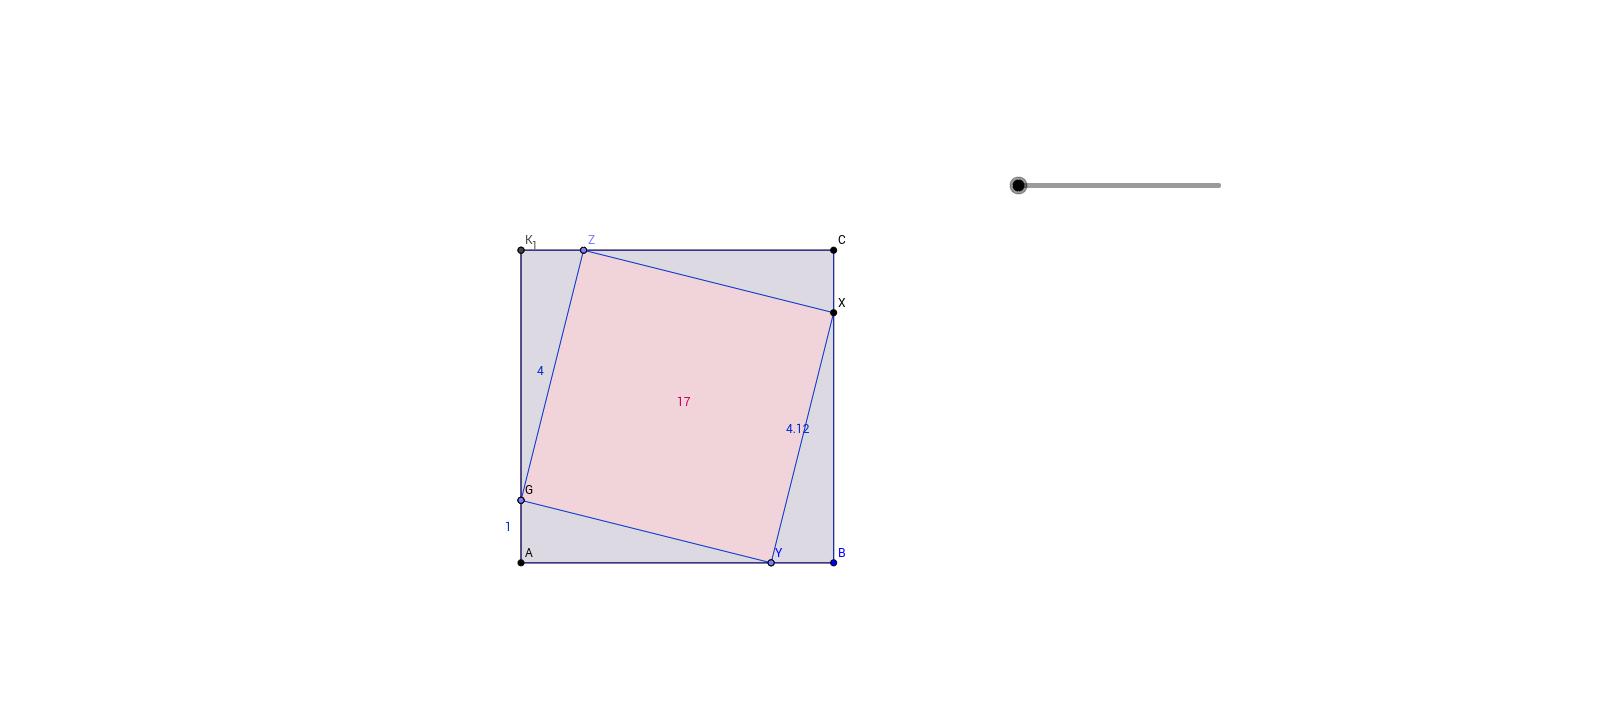 Proving the Pythagorean Theorem